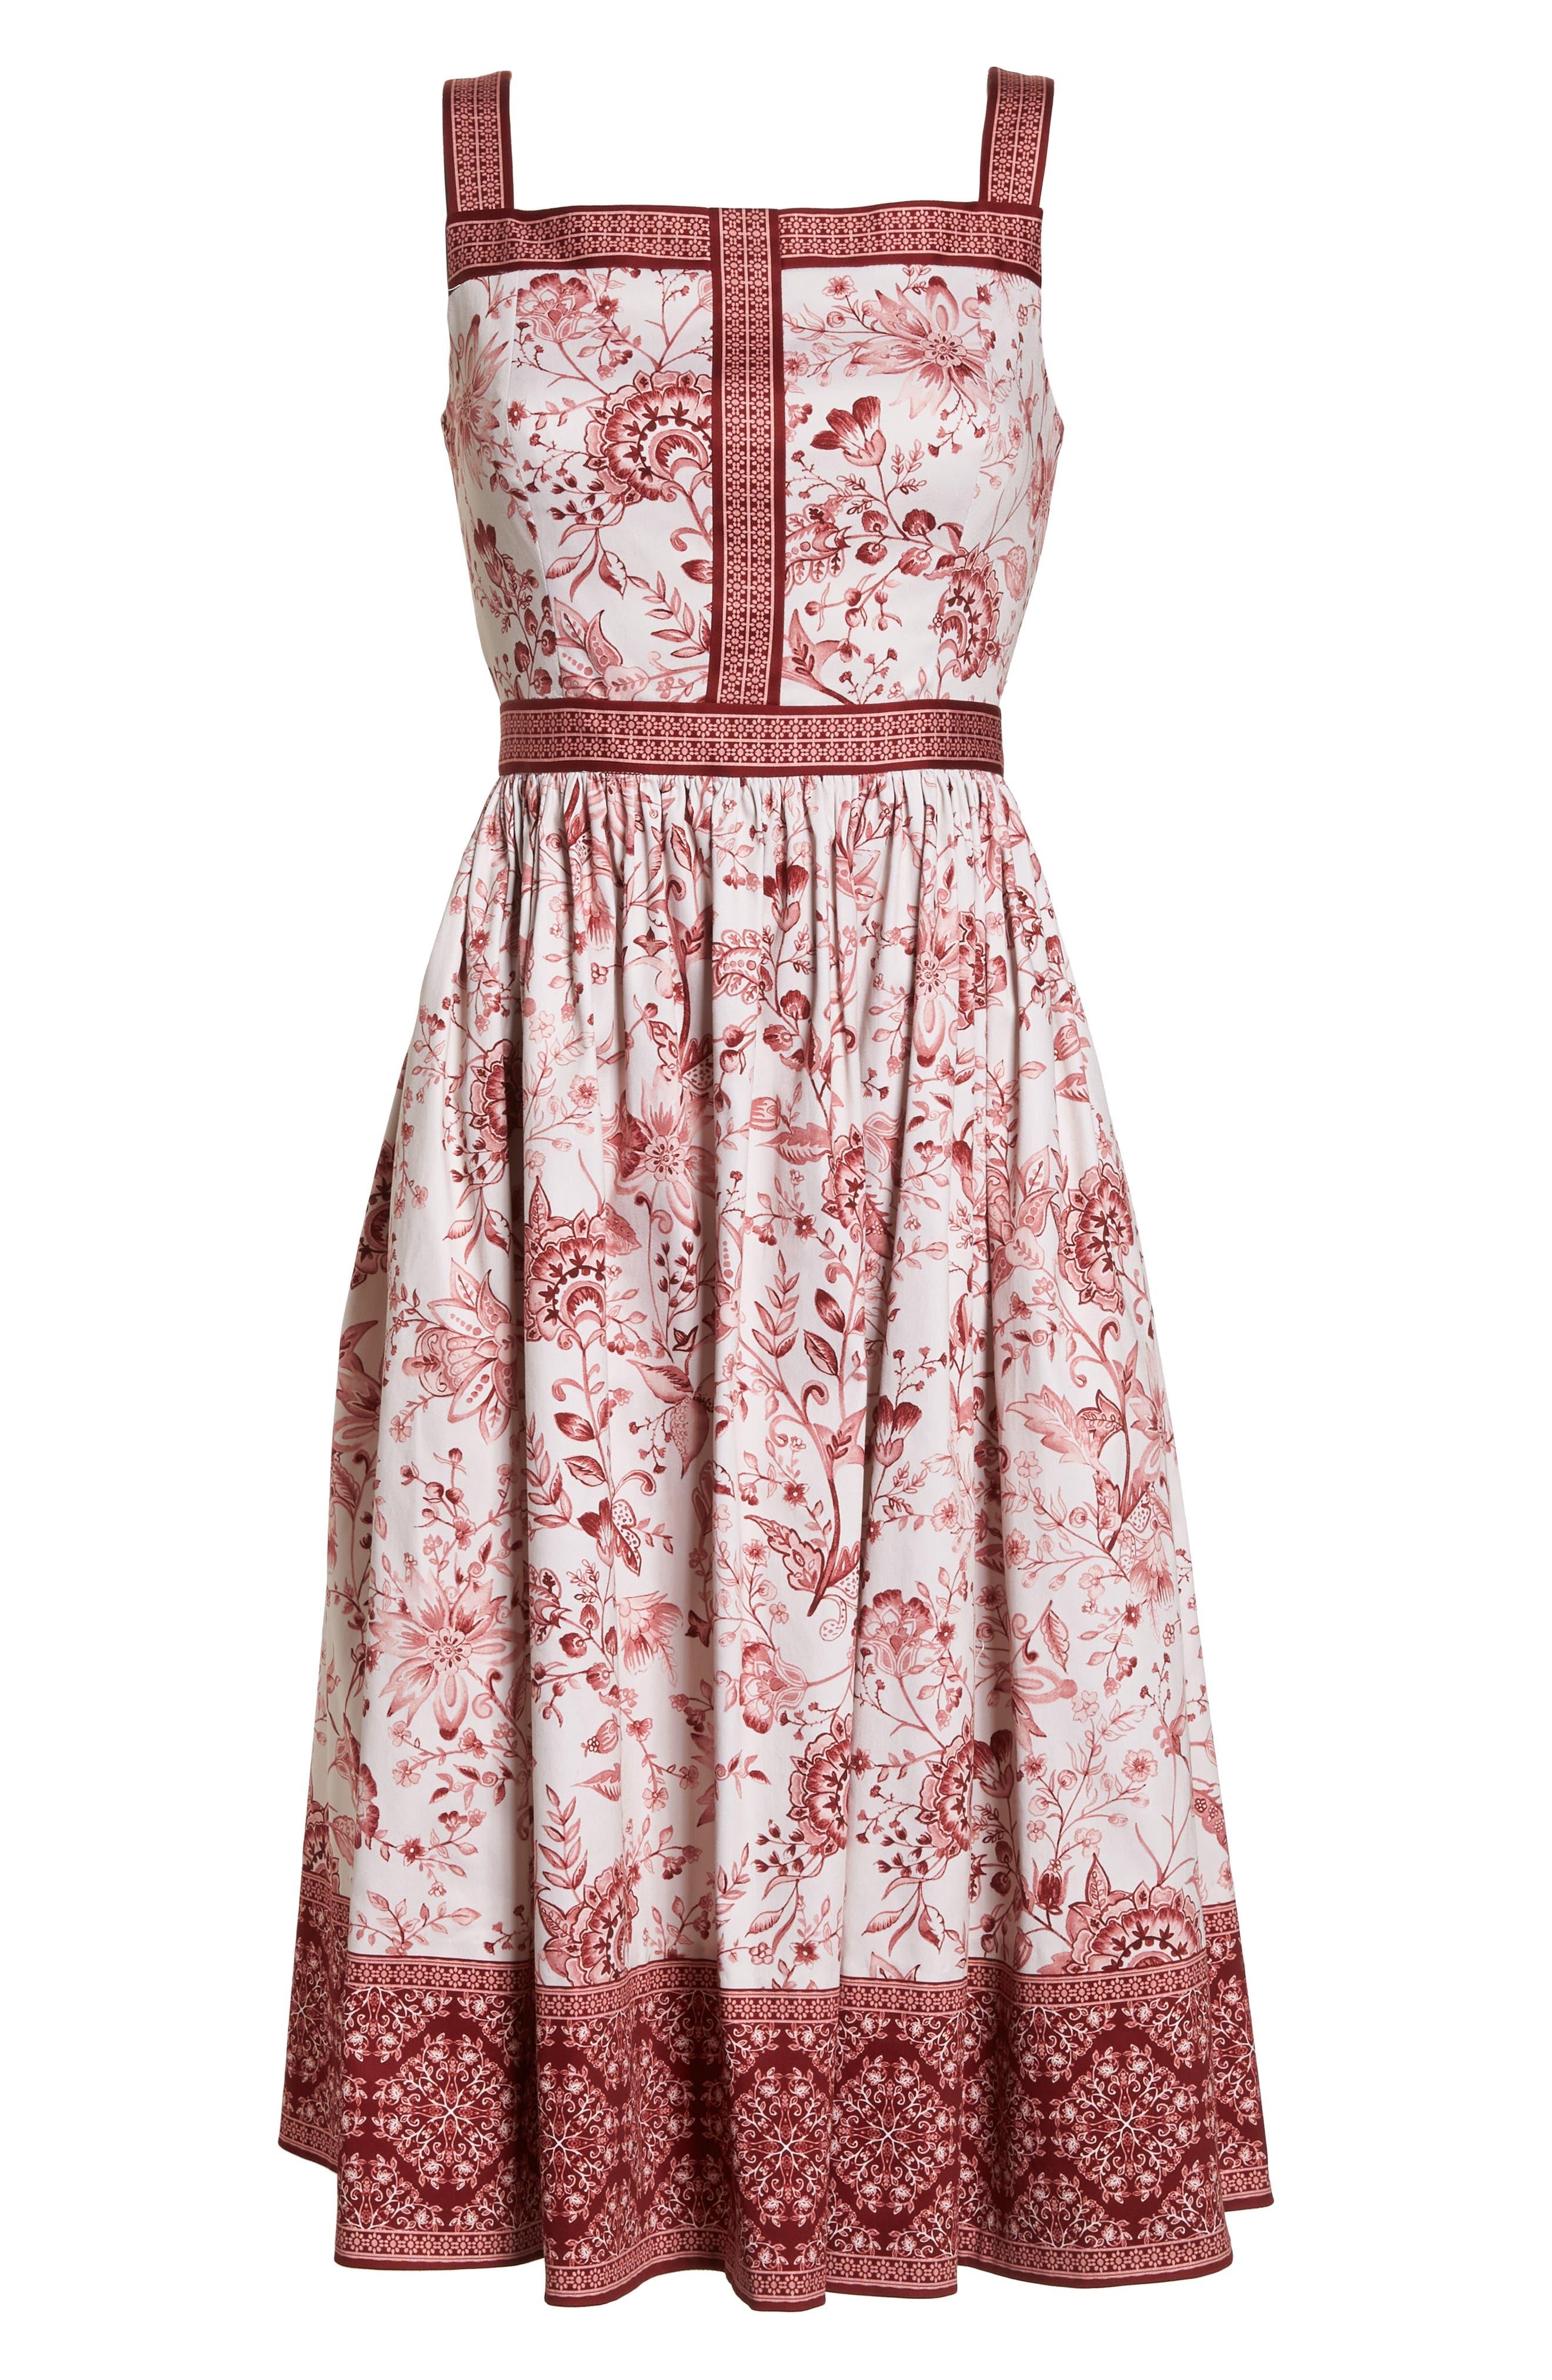 Esme Floral Fit & Flare Dress,                             Alternate thumbnail 7, color,                             690